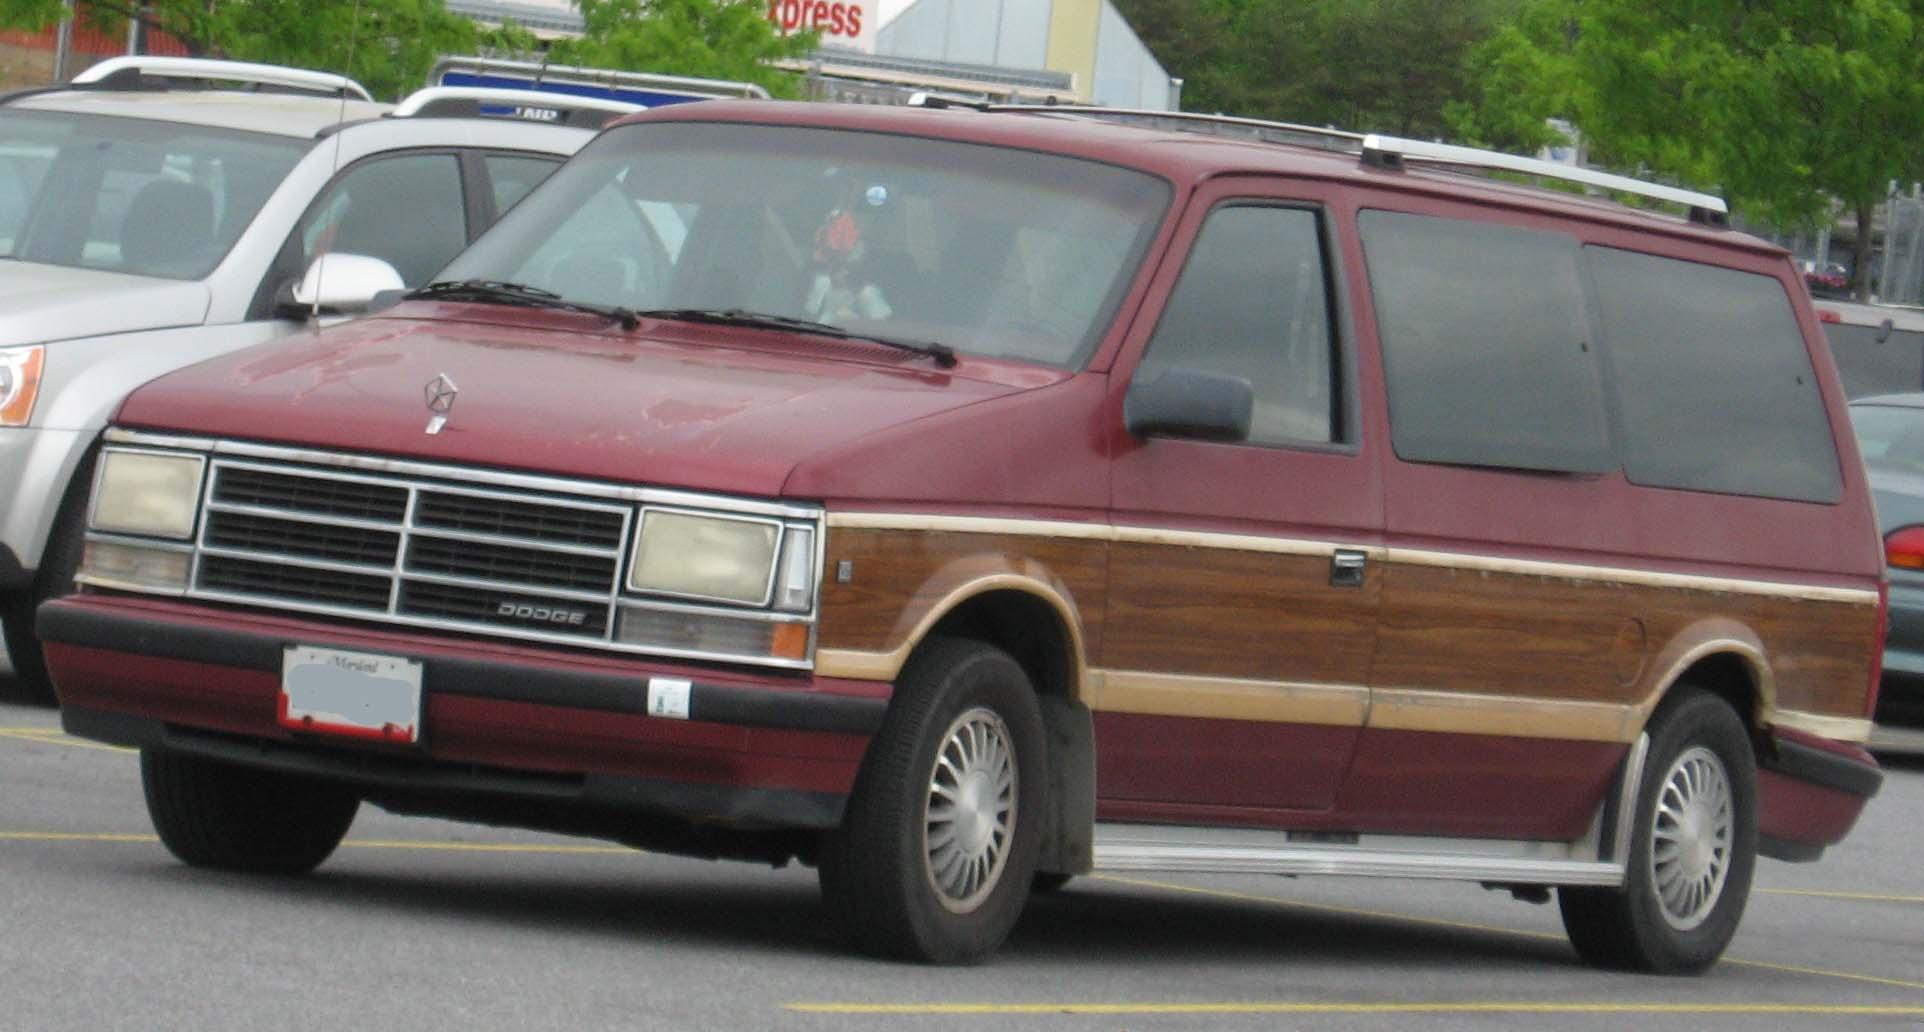 20080111144951 87 90 dodge grand caravan